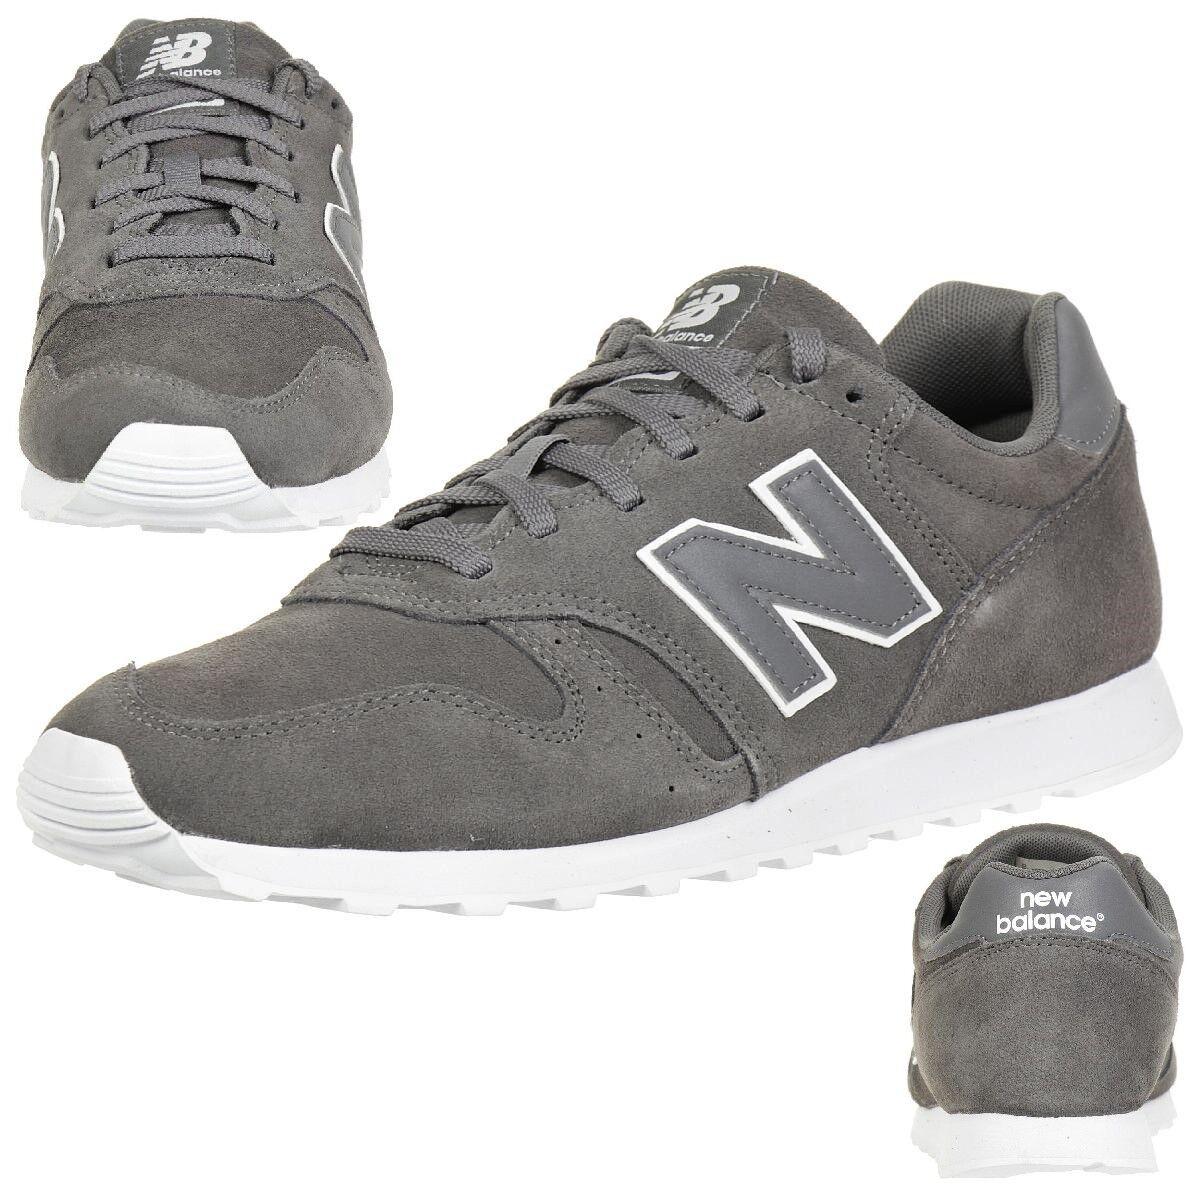 New Balance ML373TG Classic Sneaker Herren Schuhe grau 373